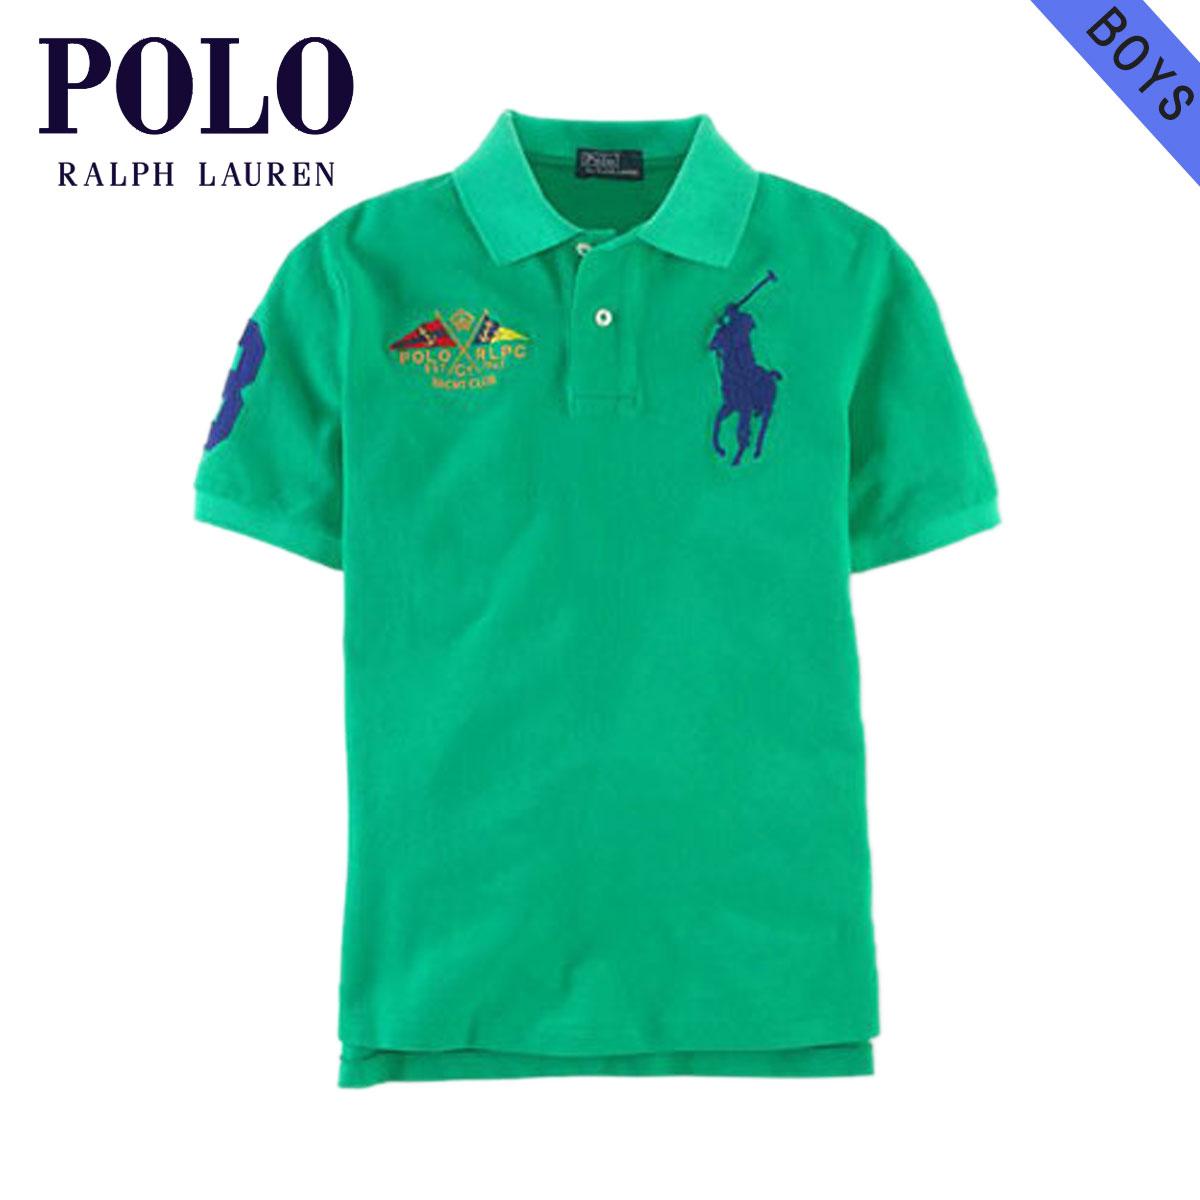 27ddc8ebed50c Poloralflorenkids POLO RALPH LAUREN CHILDREN genuine kids clothing boys  Polo Shirt Big Pony Flag Polo  18121136 GREEN 10P13Dec14